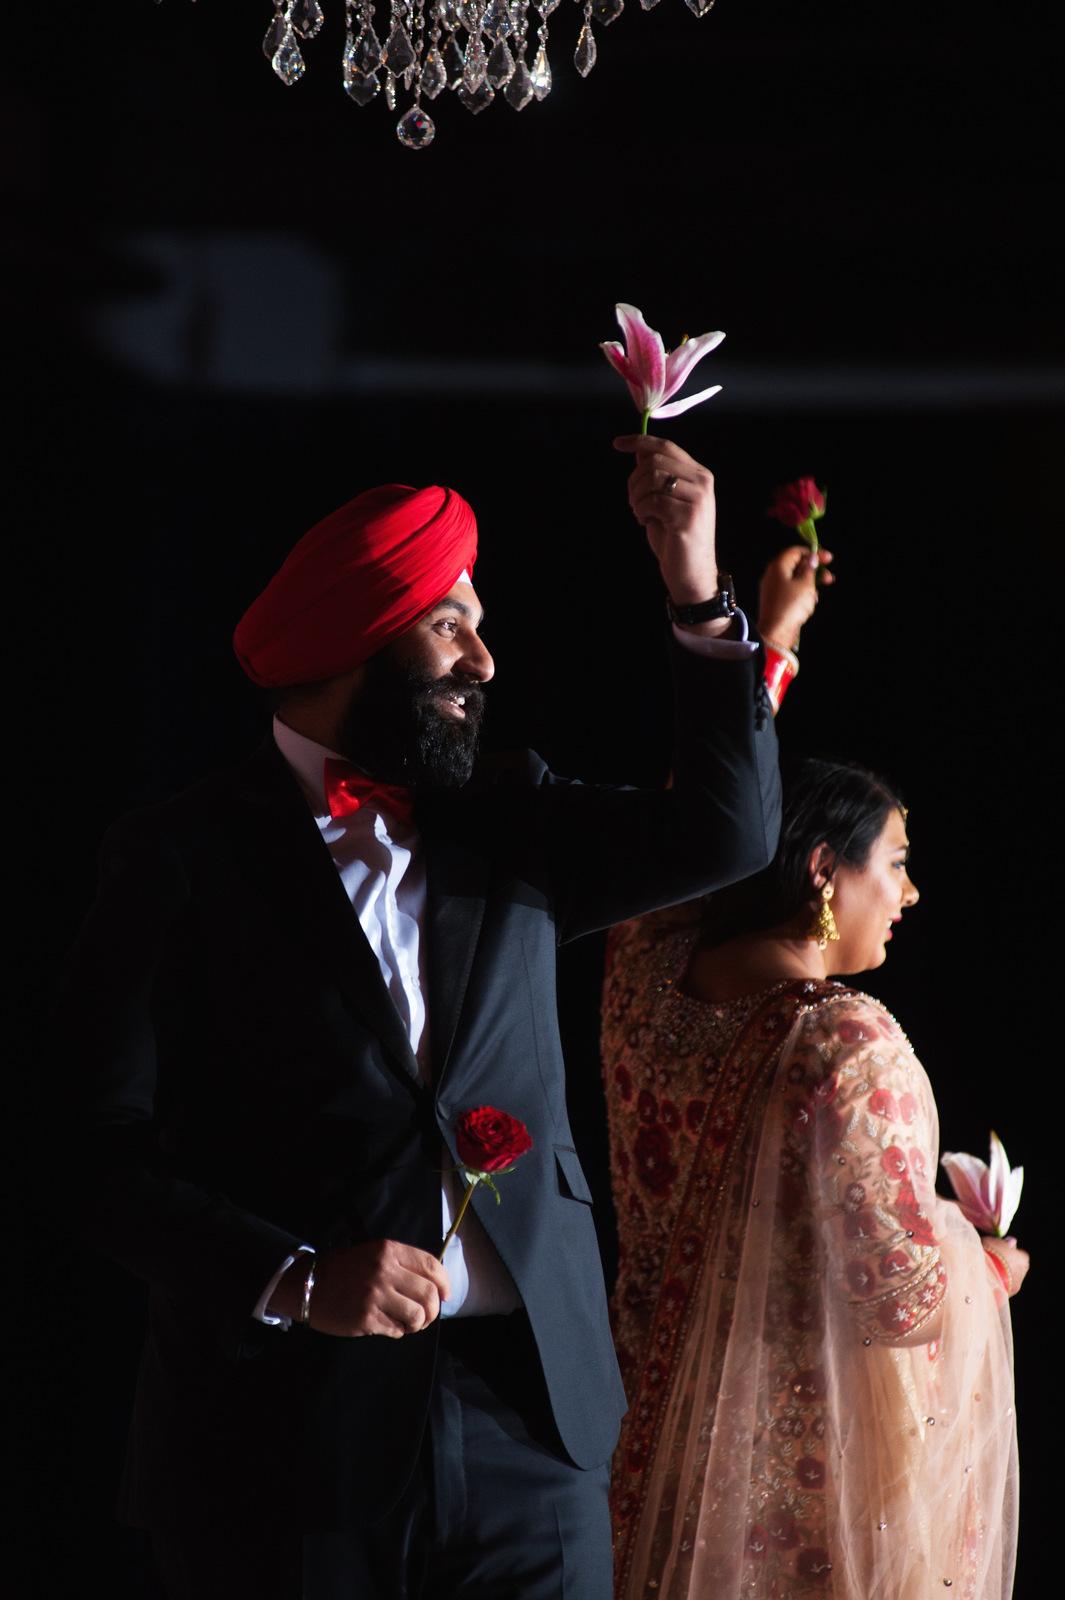 houston-weddings-manjot-karanjit-15.jpg